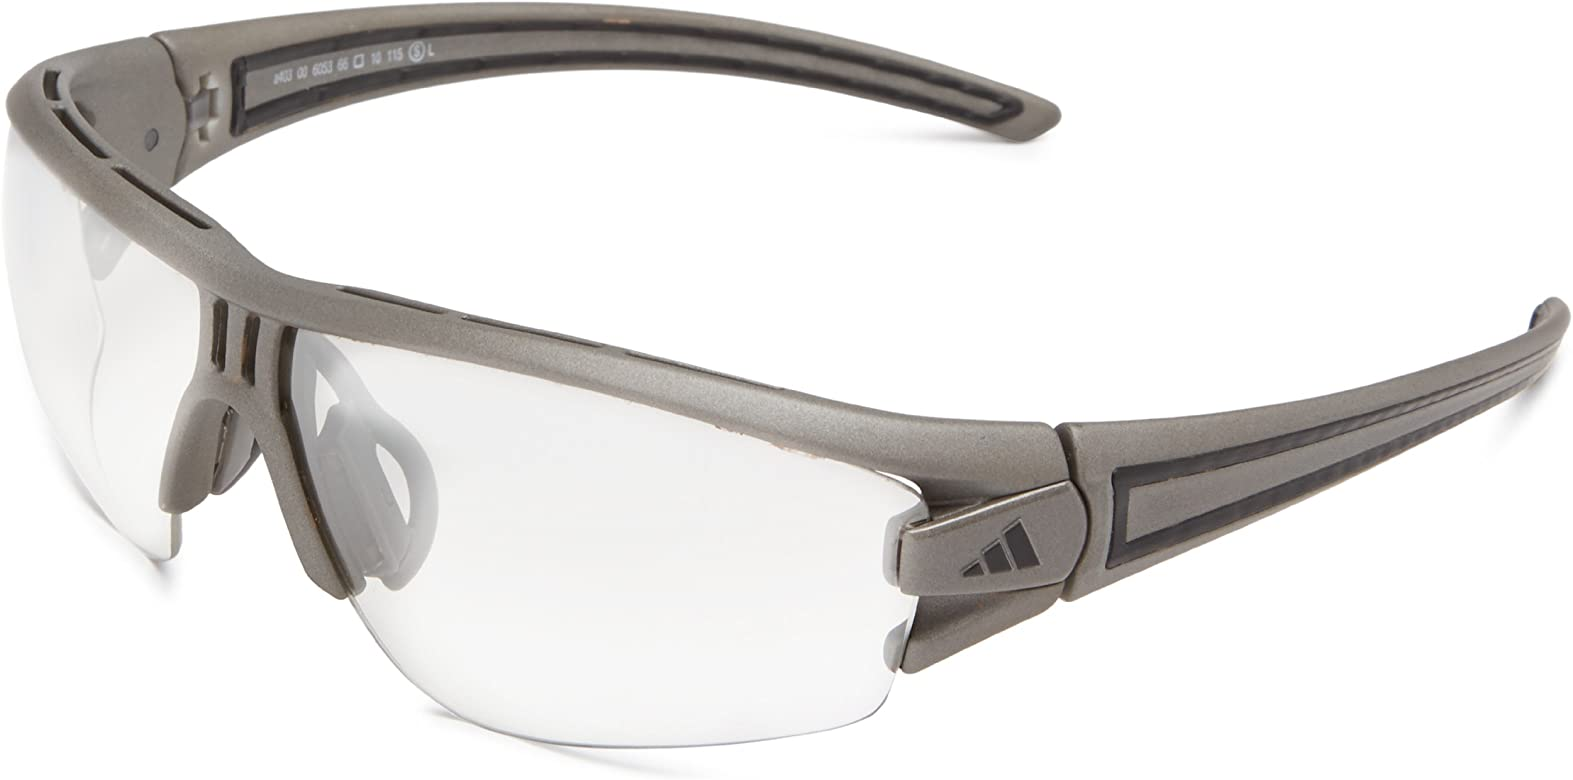 adidas gafas de sol un 403 gris 6053 redondo mal de ojo ...